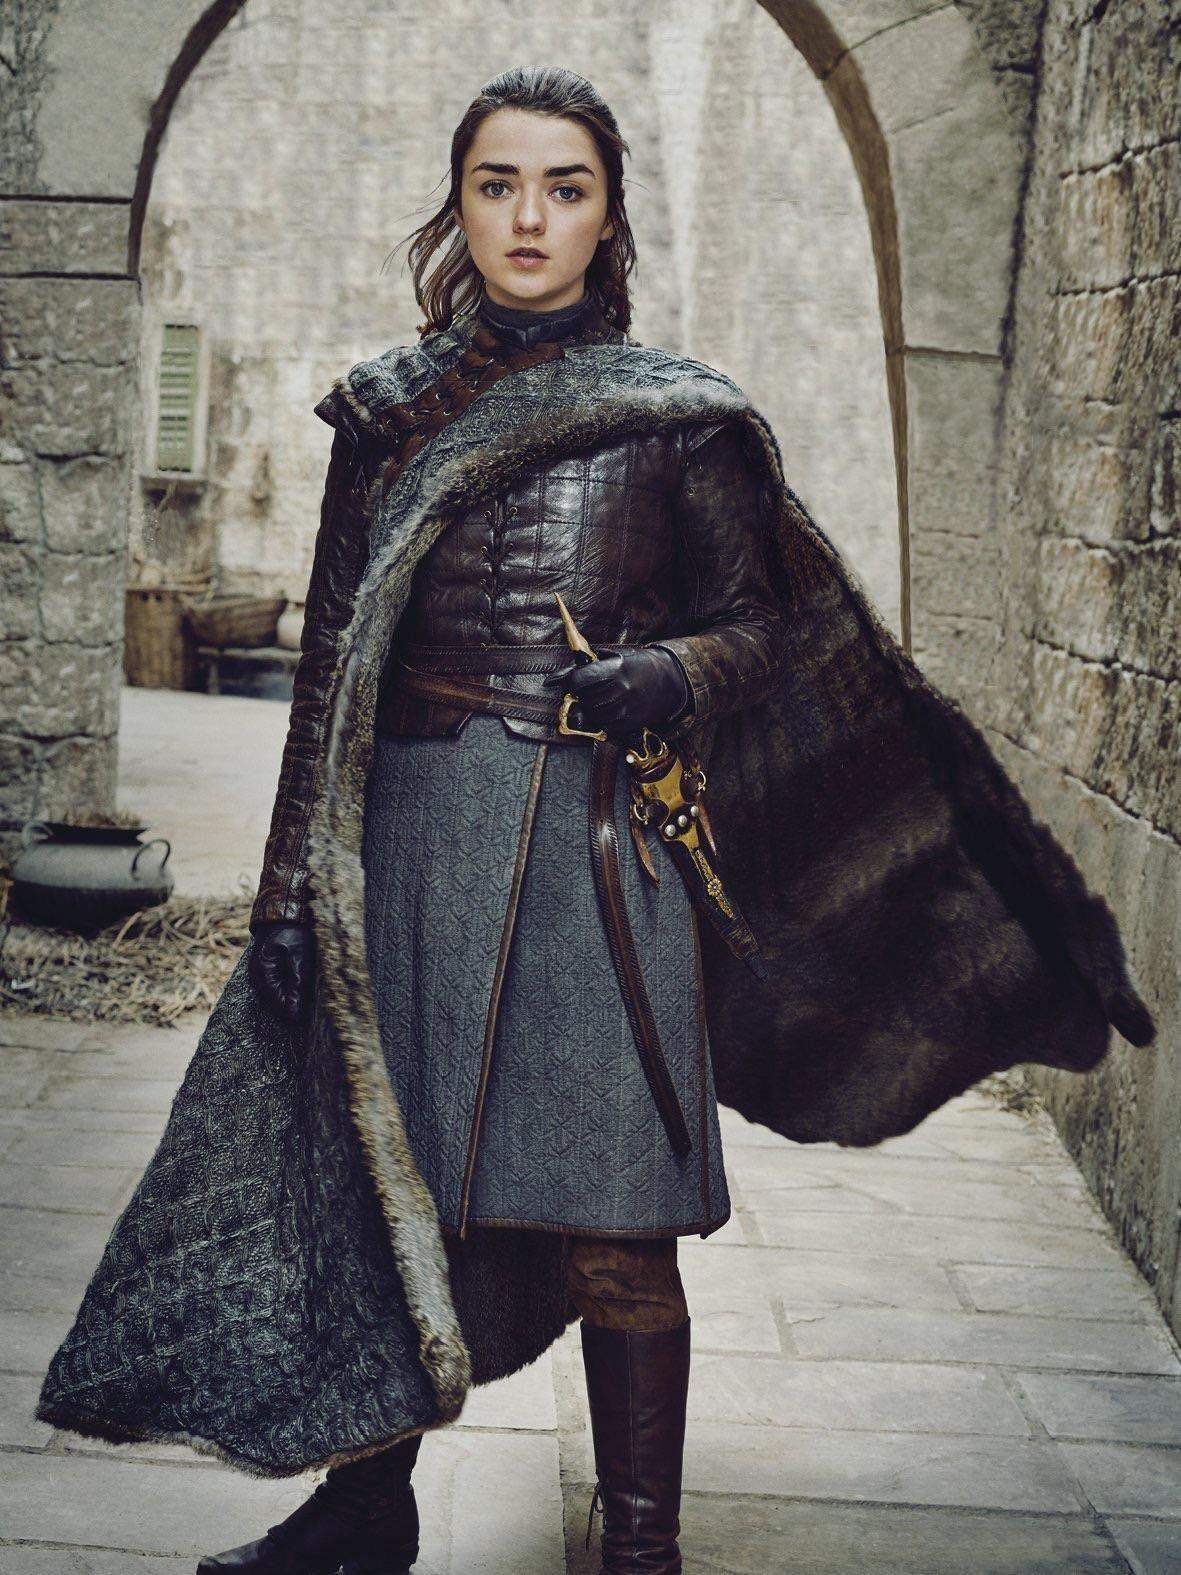 Game of Thrones Arya among 200 most popular names - BBC News